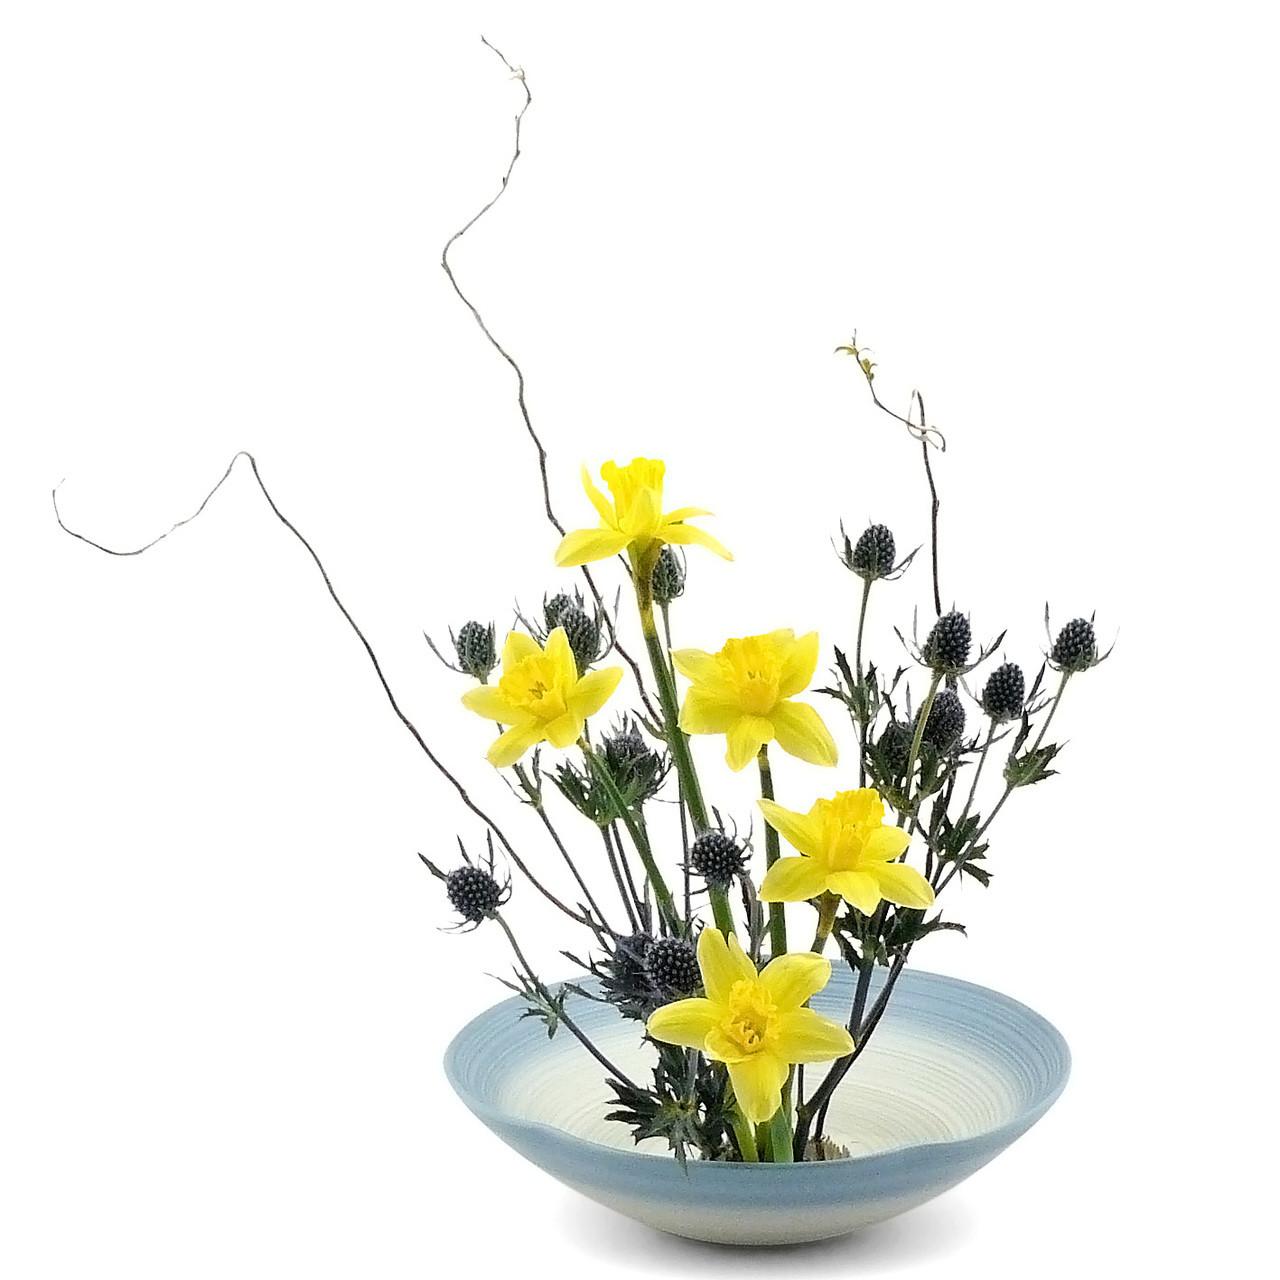 Morning Snow Ikebana Vase with flower arrangement